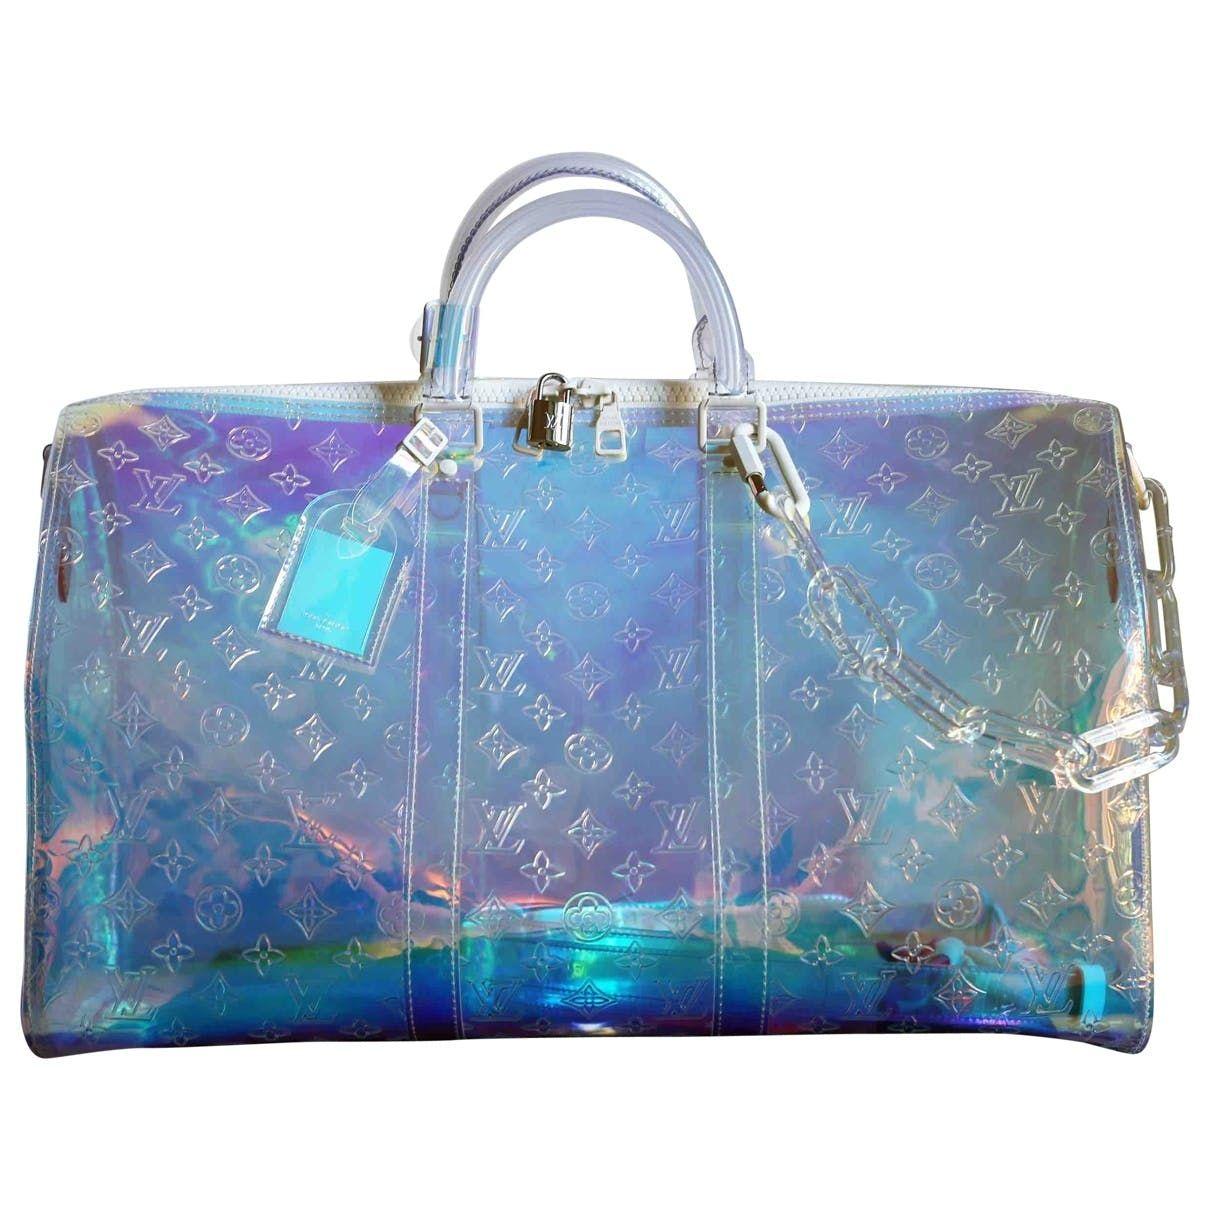 Keepall Prism Weekend Bag Louis Vuitton Silver In Plastic 6894173 Louis Vuitton Duffle Bag Bags Designer Fashion Louis Vuitton Handbags